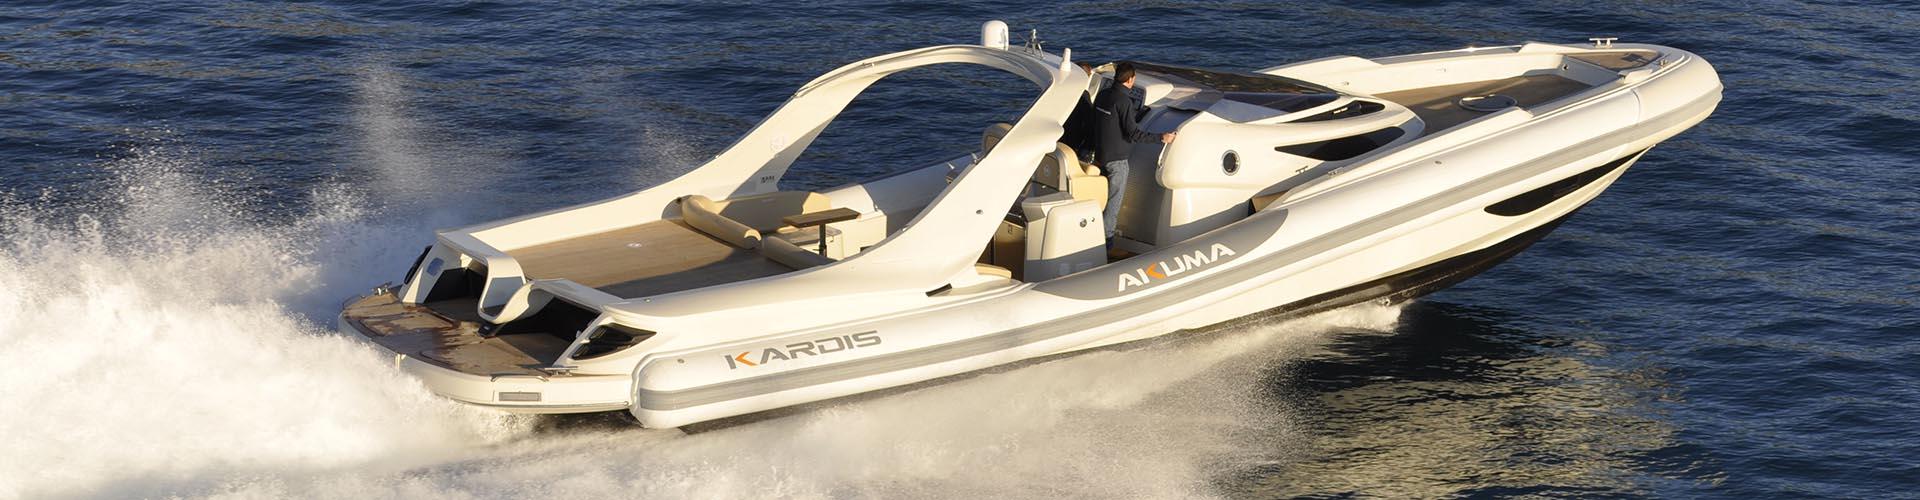 Kardis-Akuma-50-yacht-running